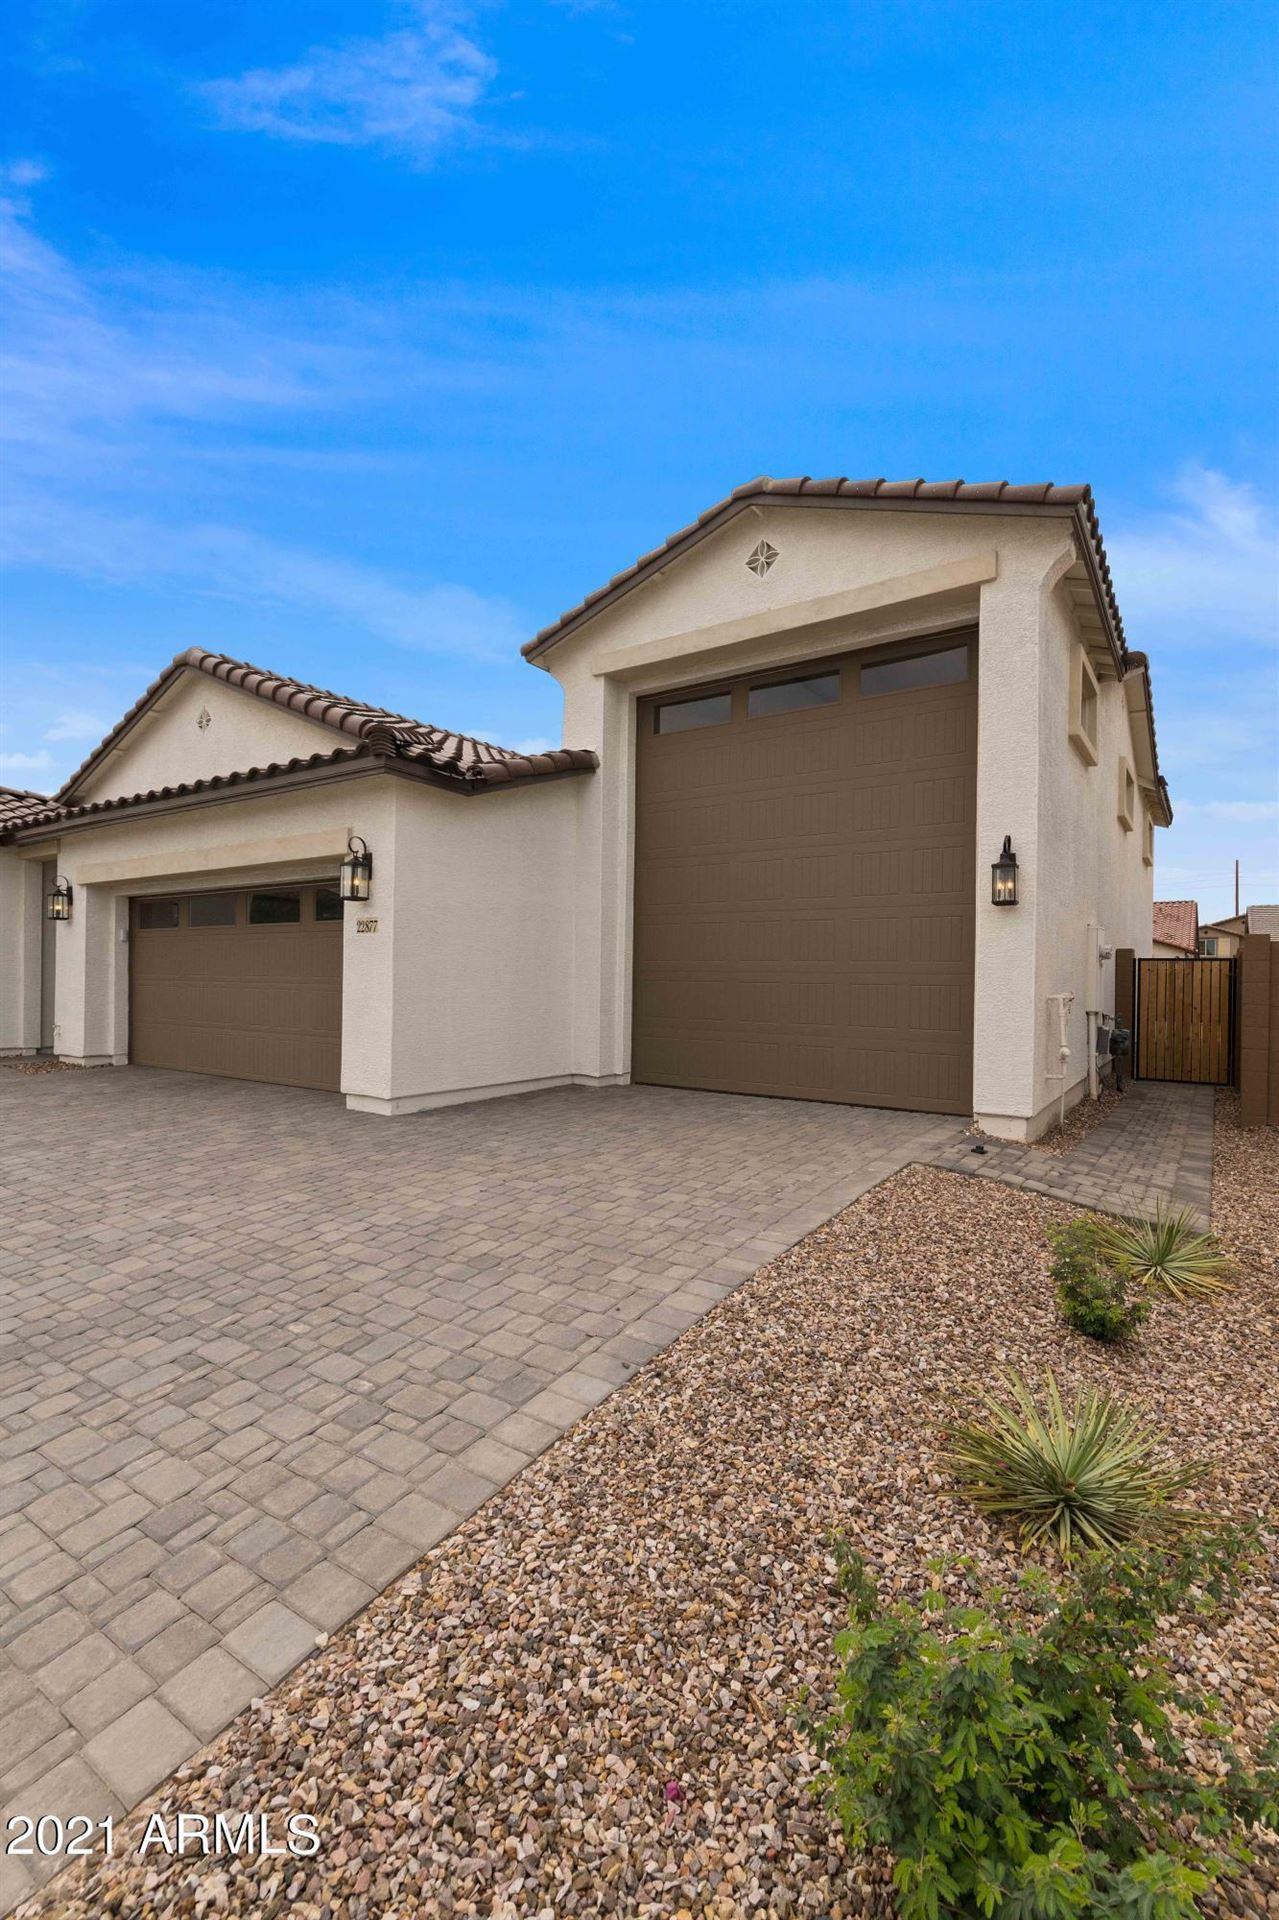 Photo of 22877 E DOMINGO Road, Queen Creek, AZ 85142 (MLS # 6267154)